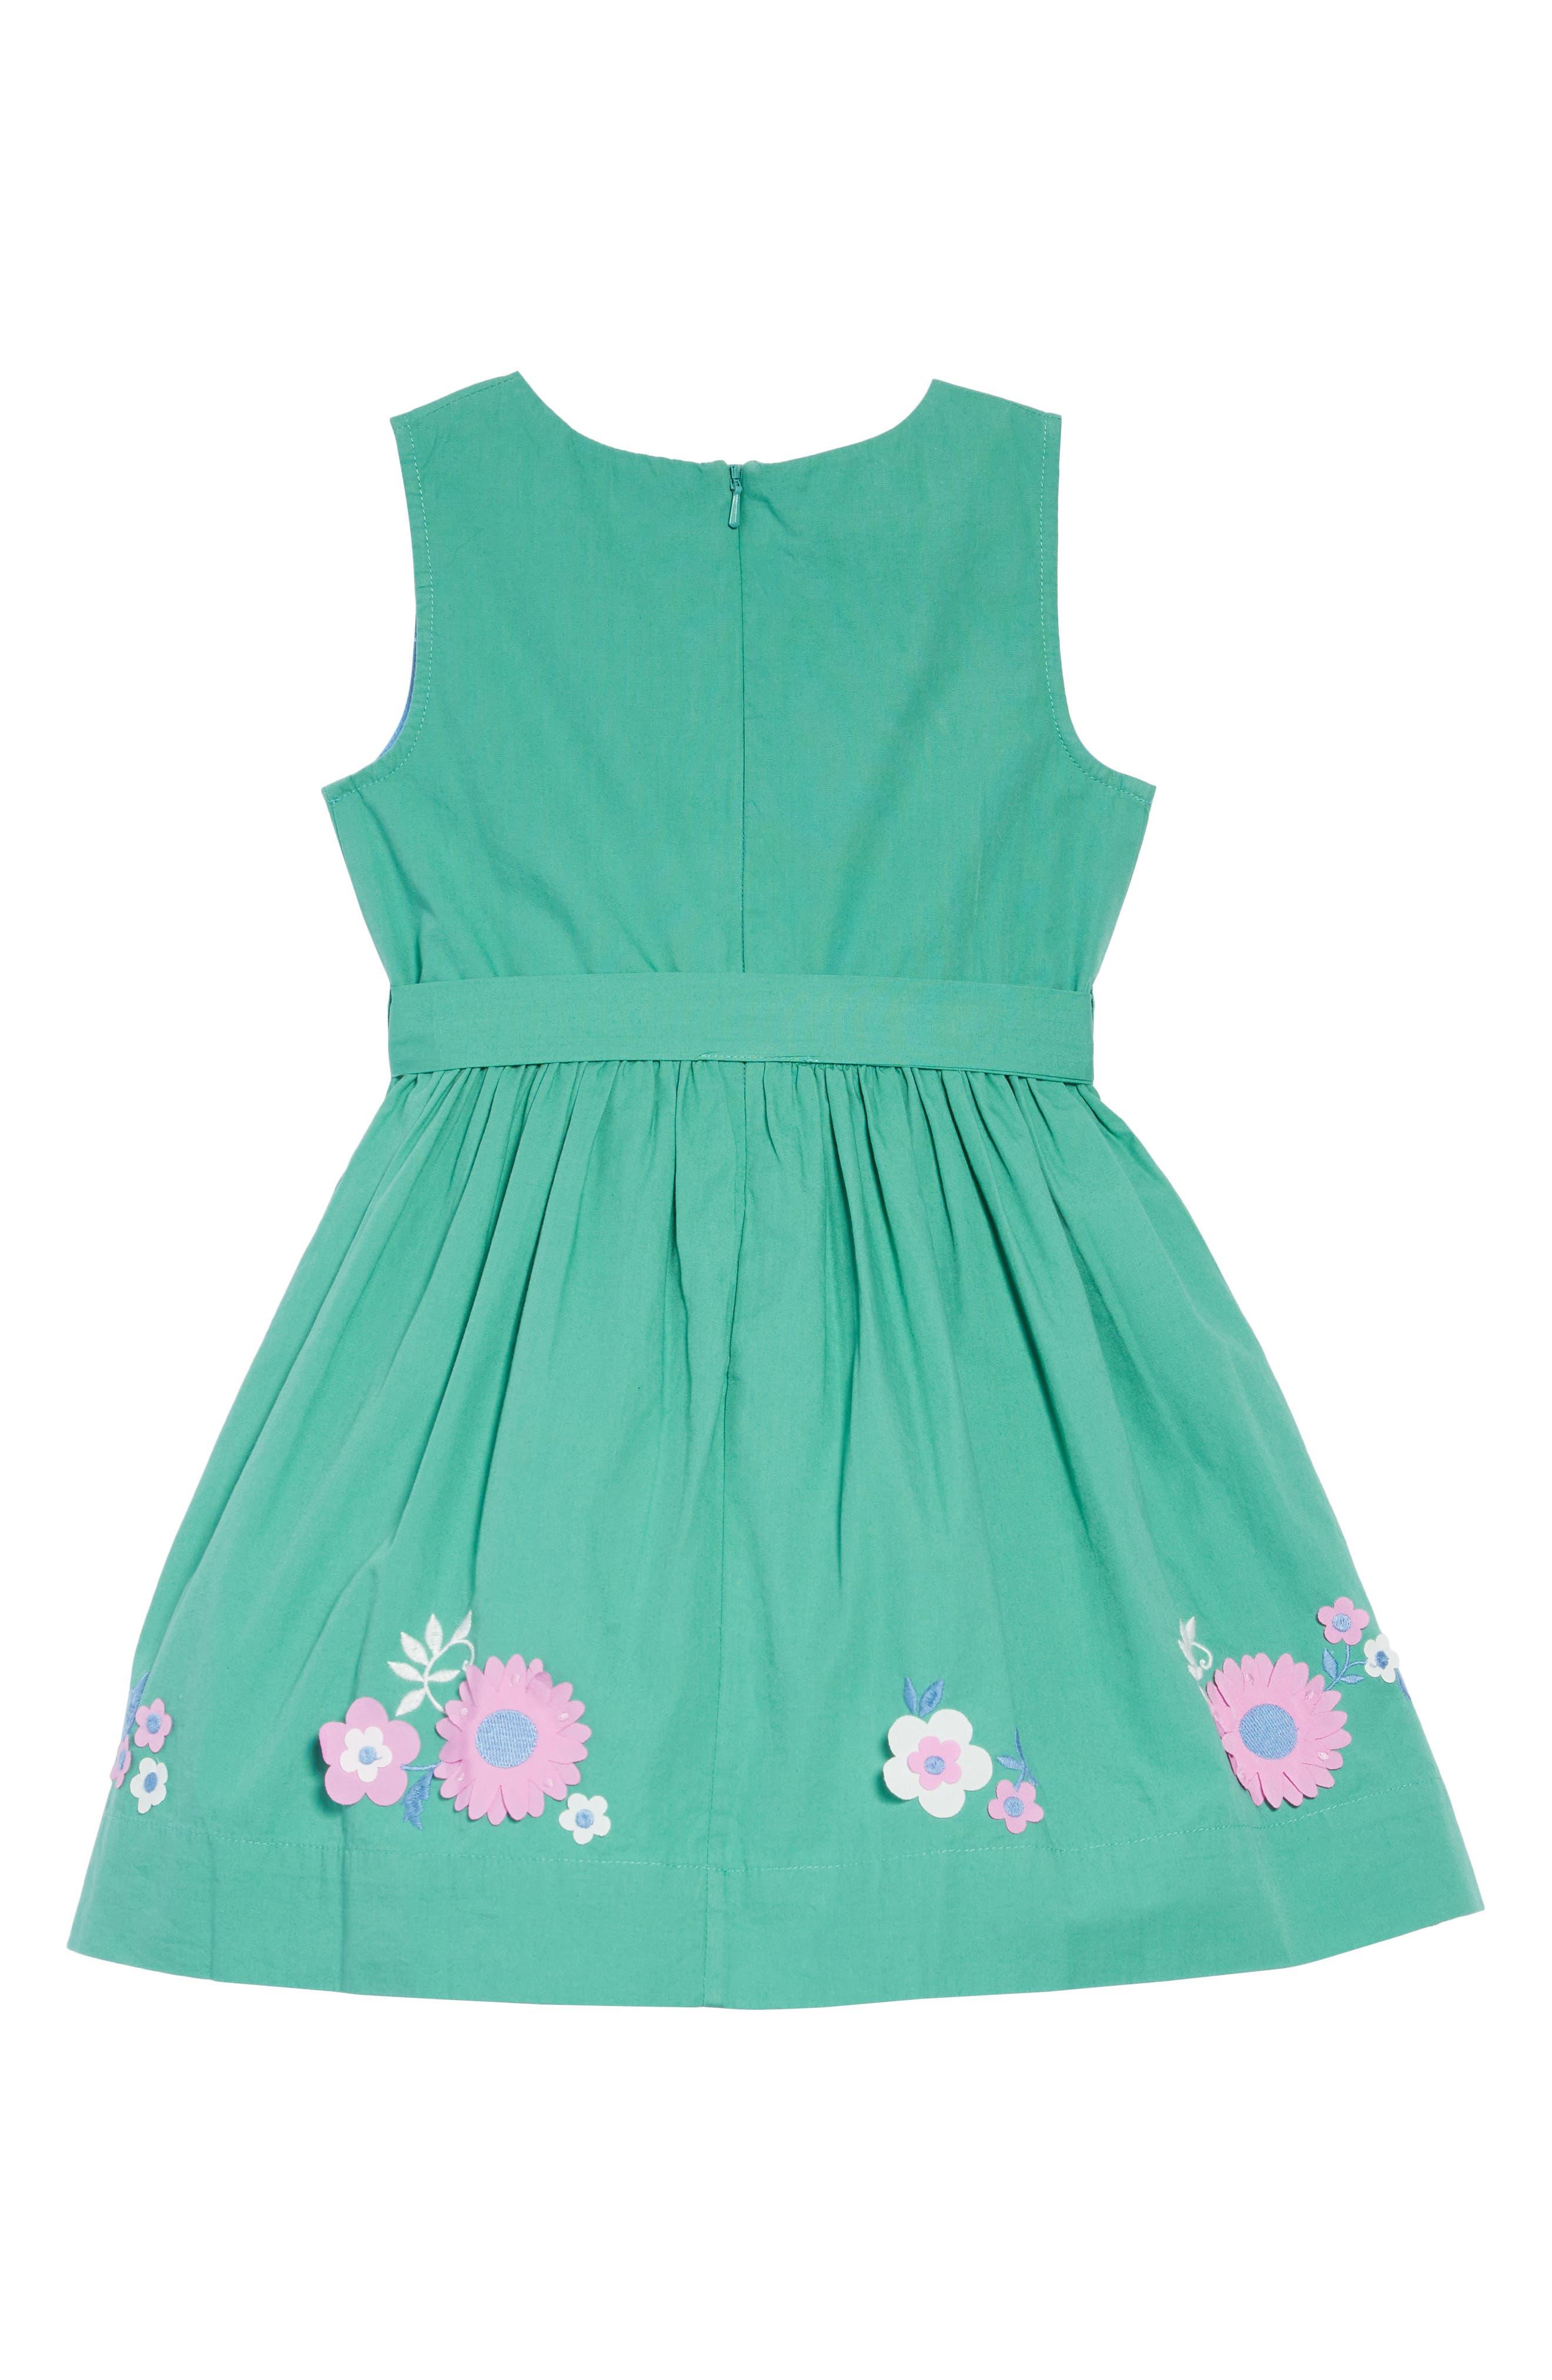 3efb9005592 Mini Boden Kids  Clothing